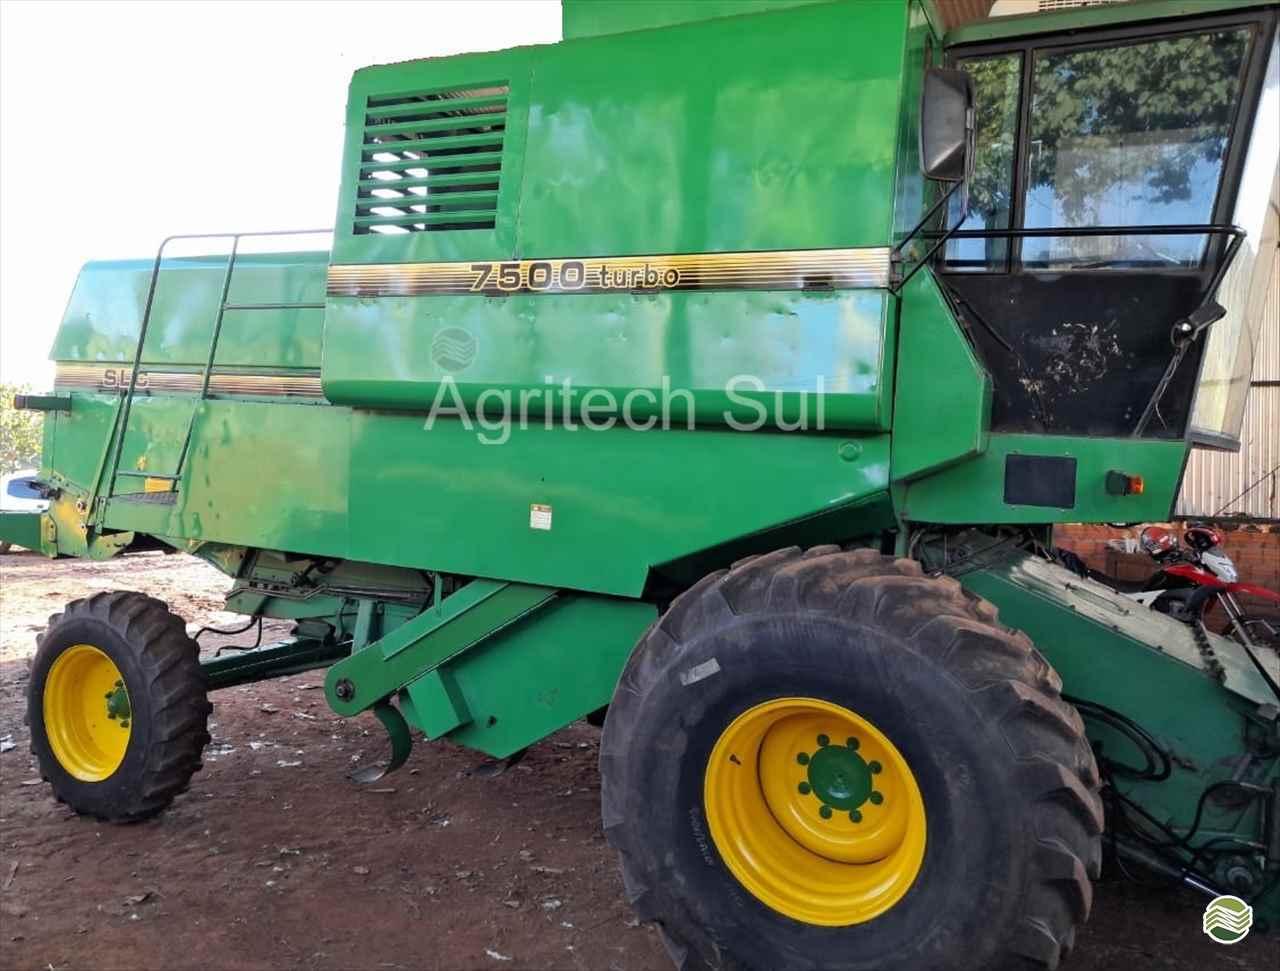 SLC 7500 de Agritech Sul - PASSO FUNDO/RS